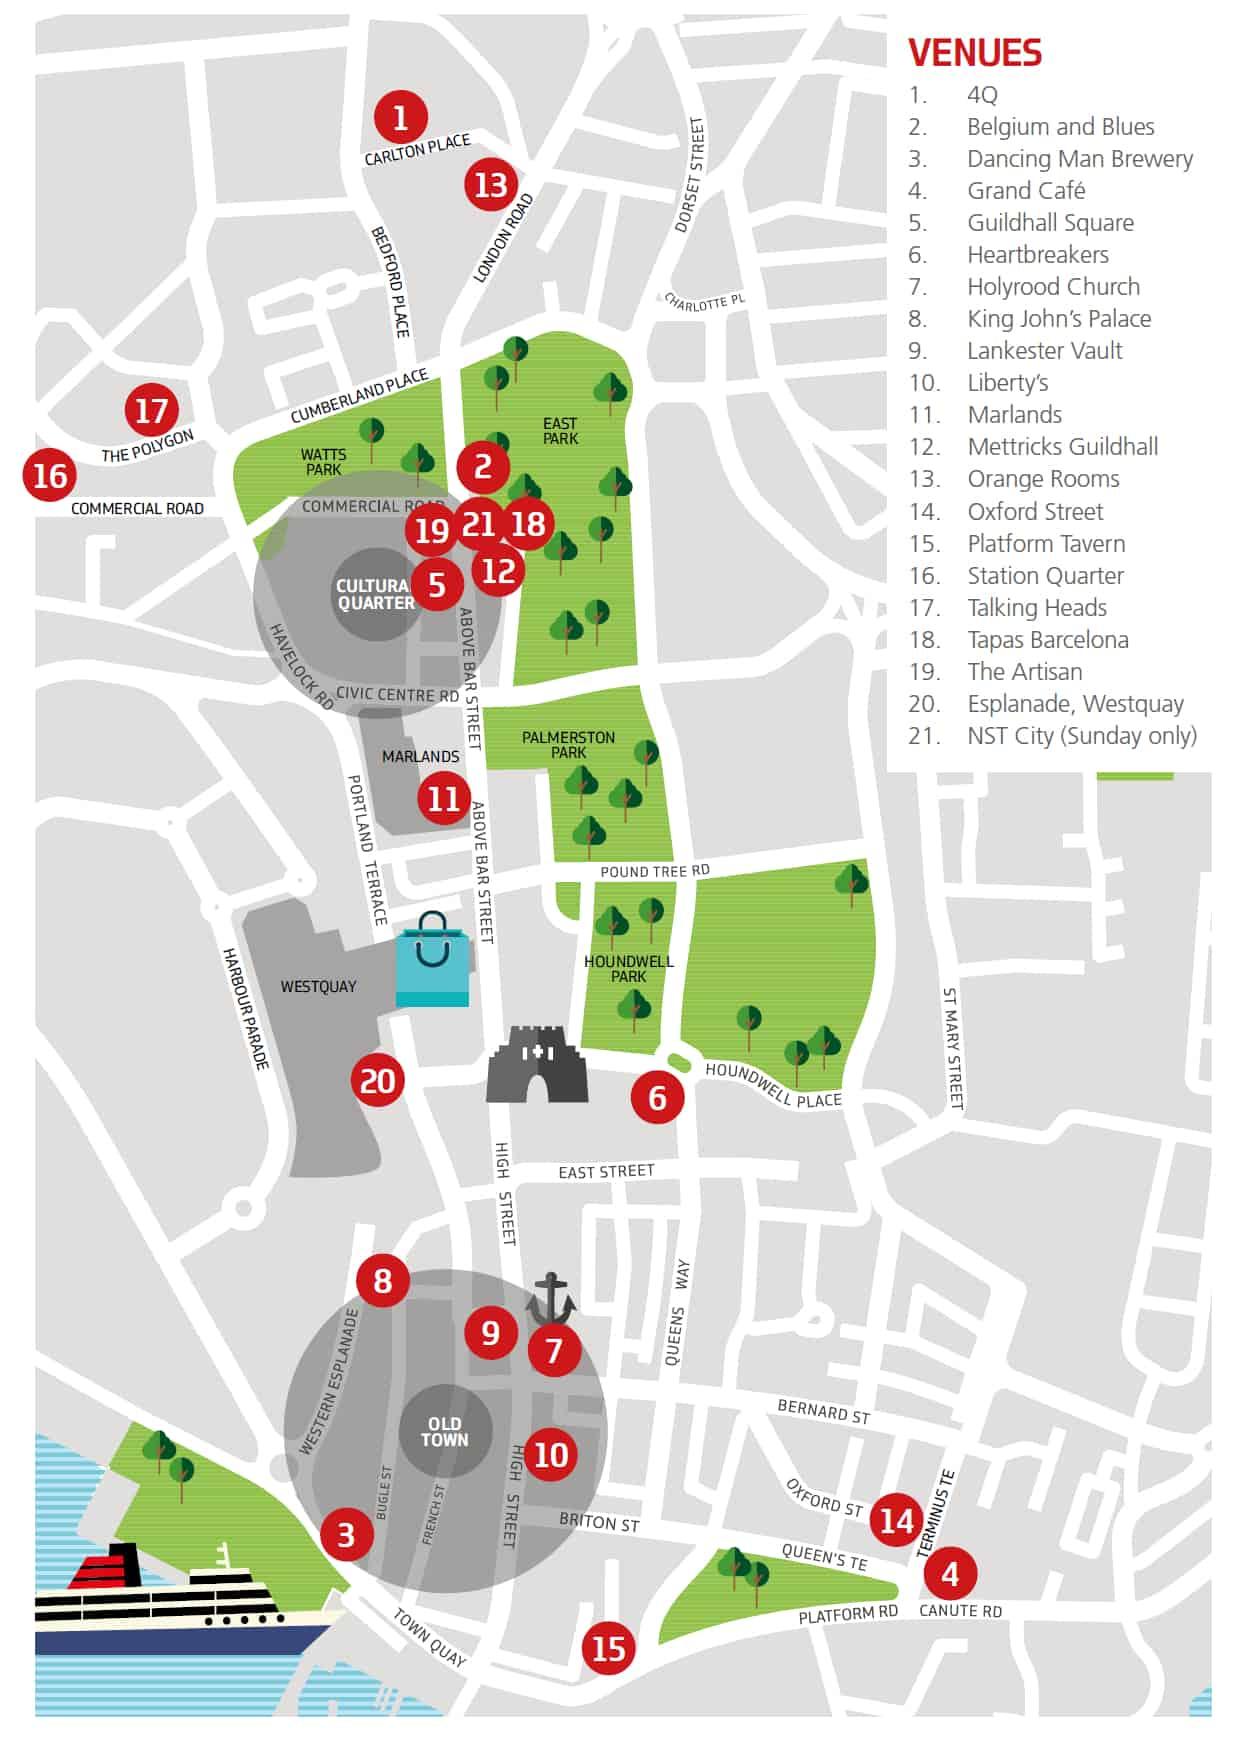 mitc-venue-map